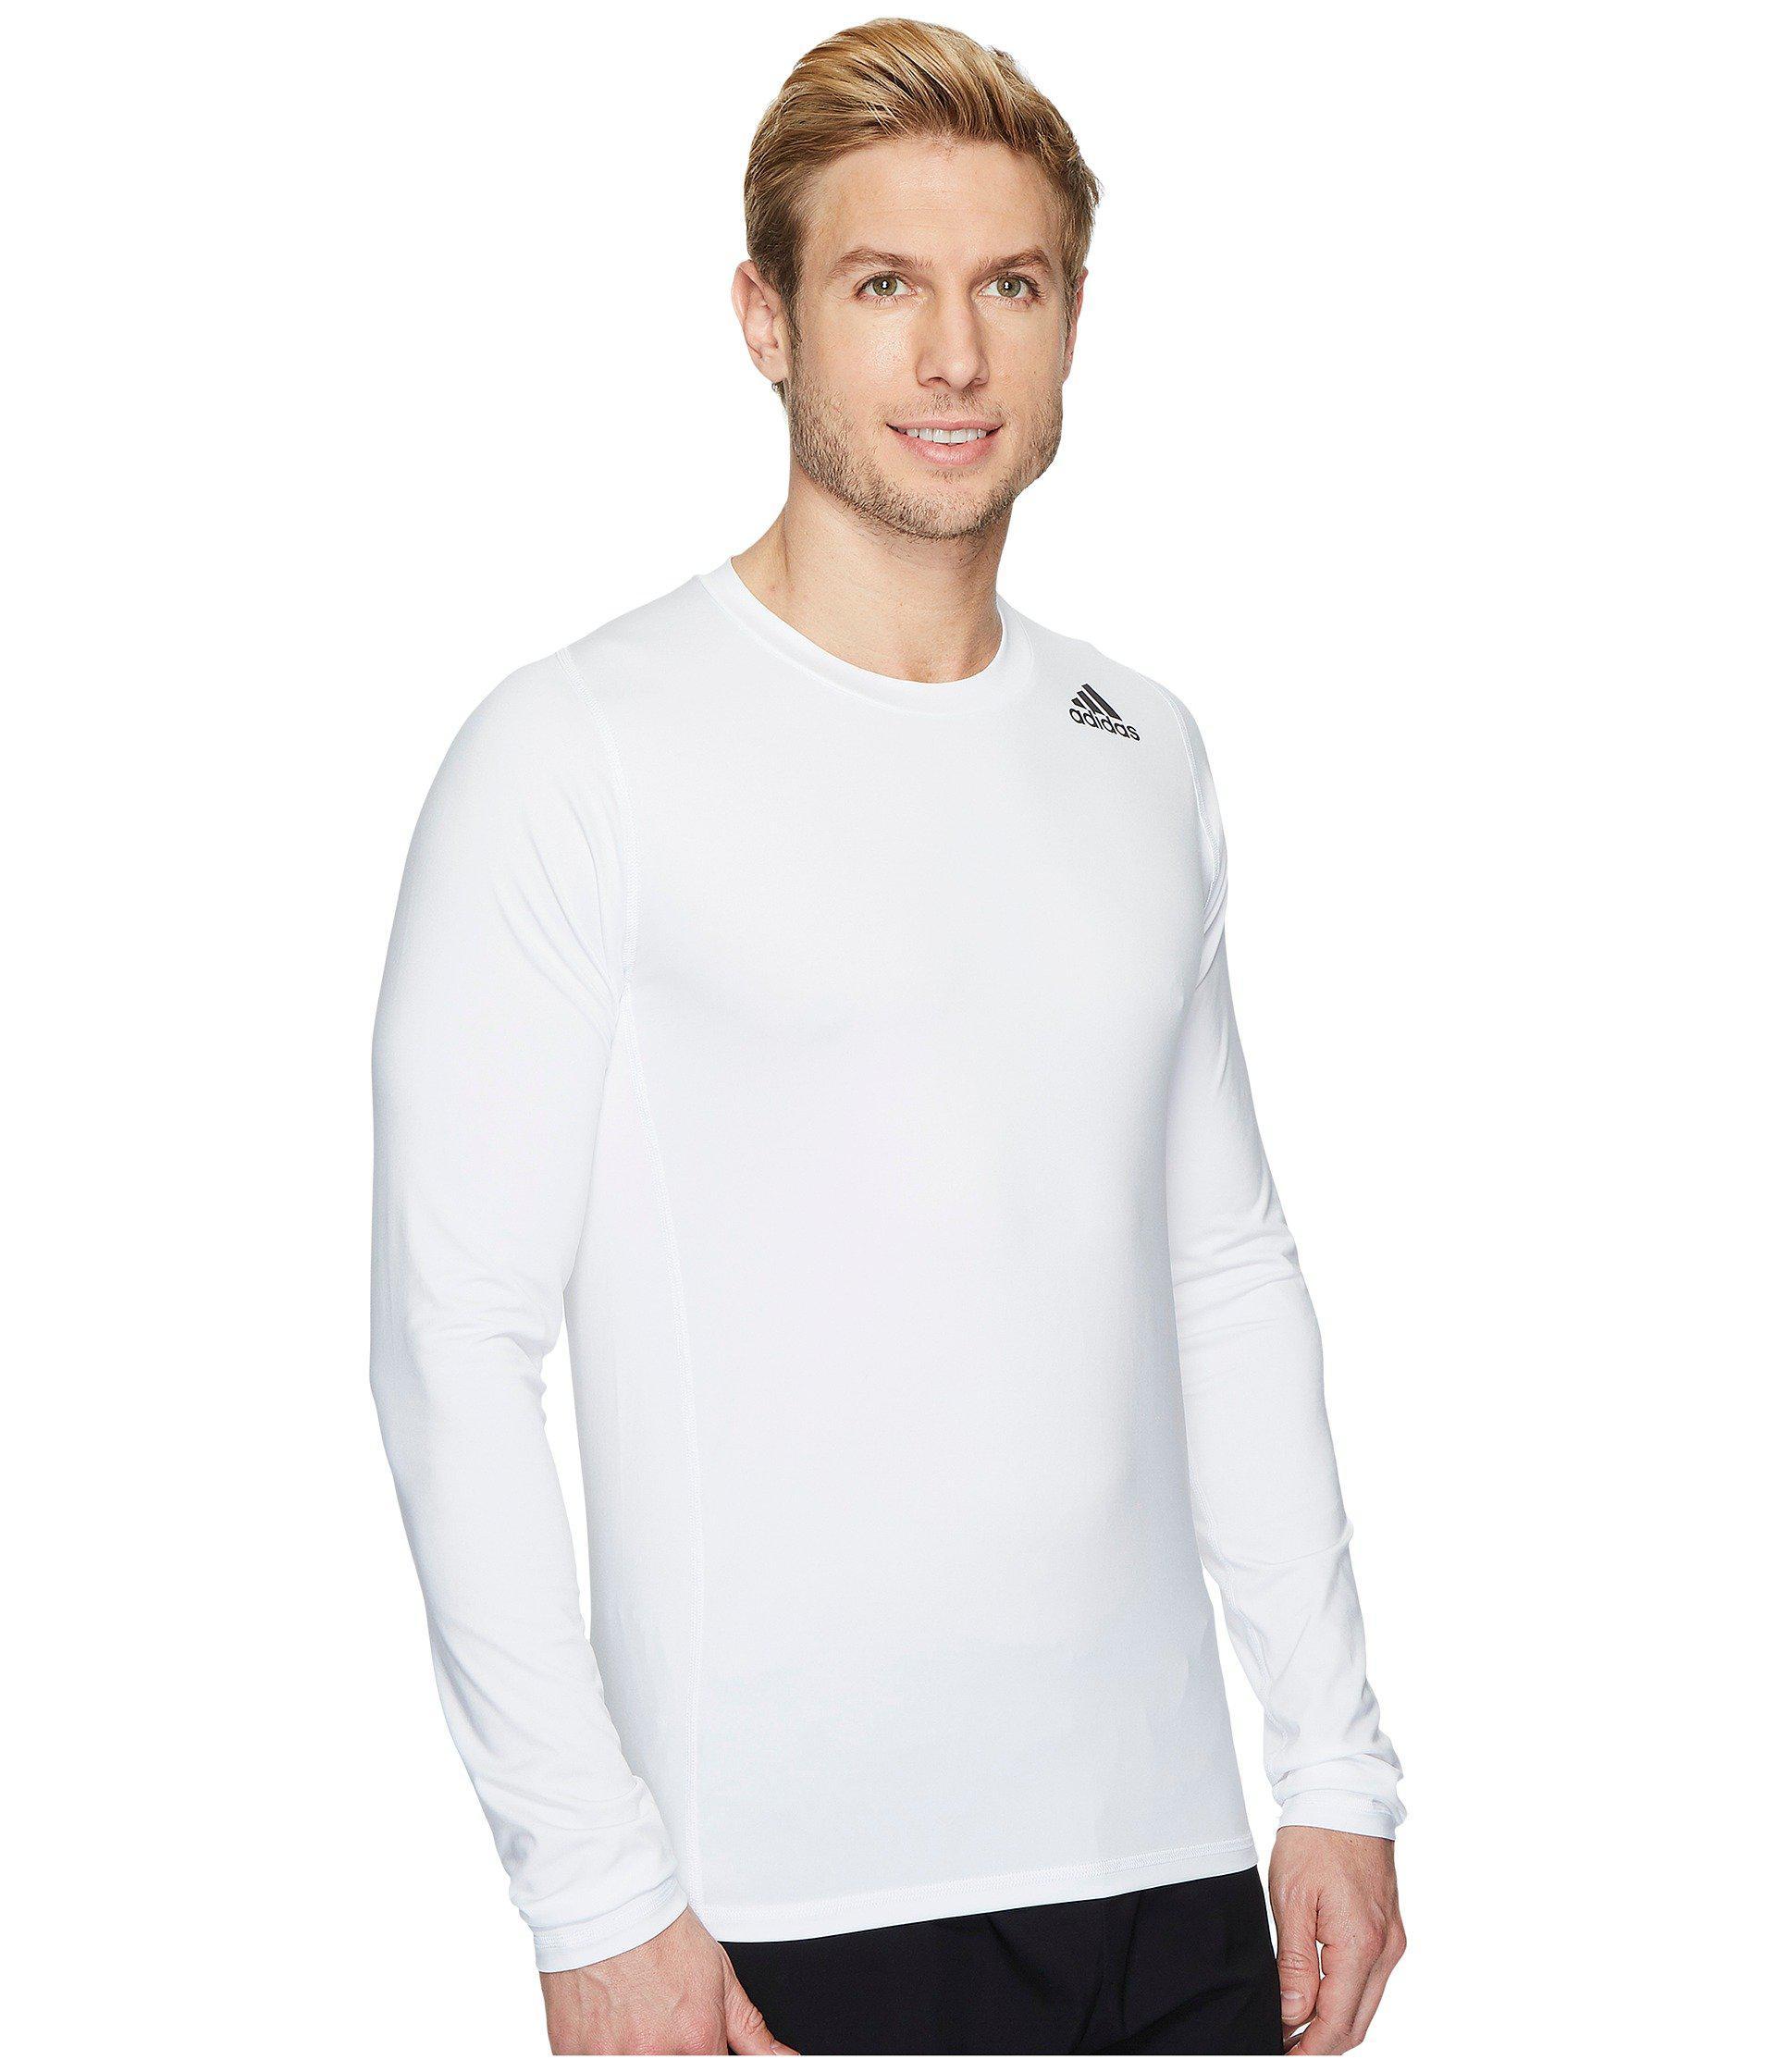 5541ec7a4fa7f Men's Long Sleeve Alphaskin Sport Tee (white) T Shirt